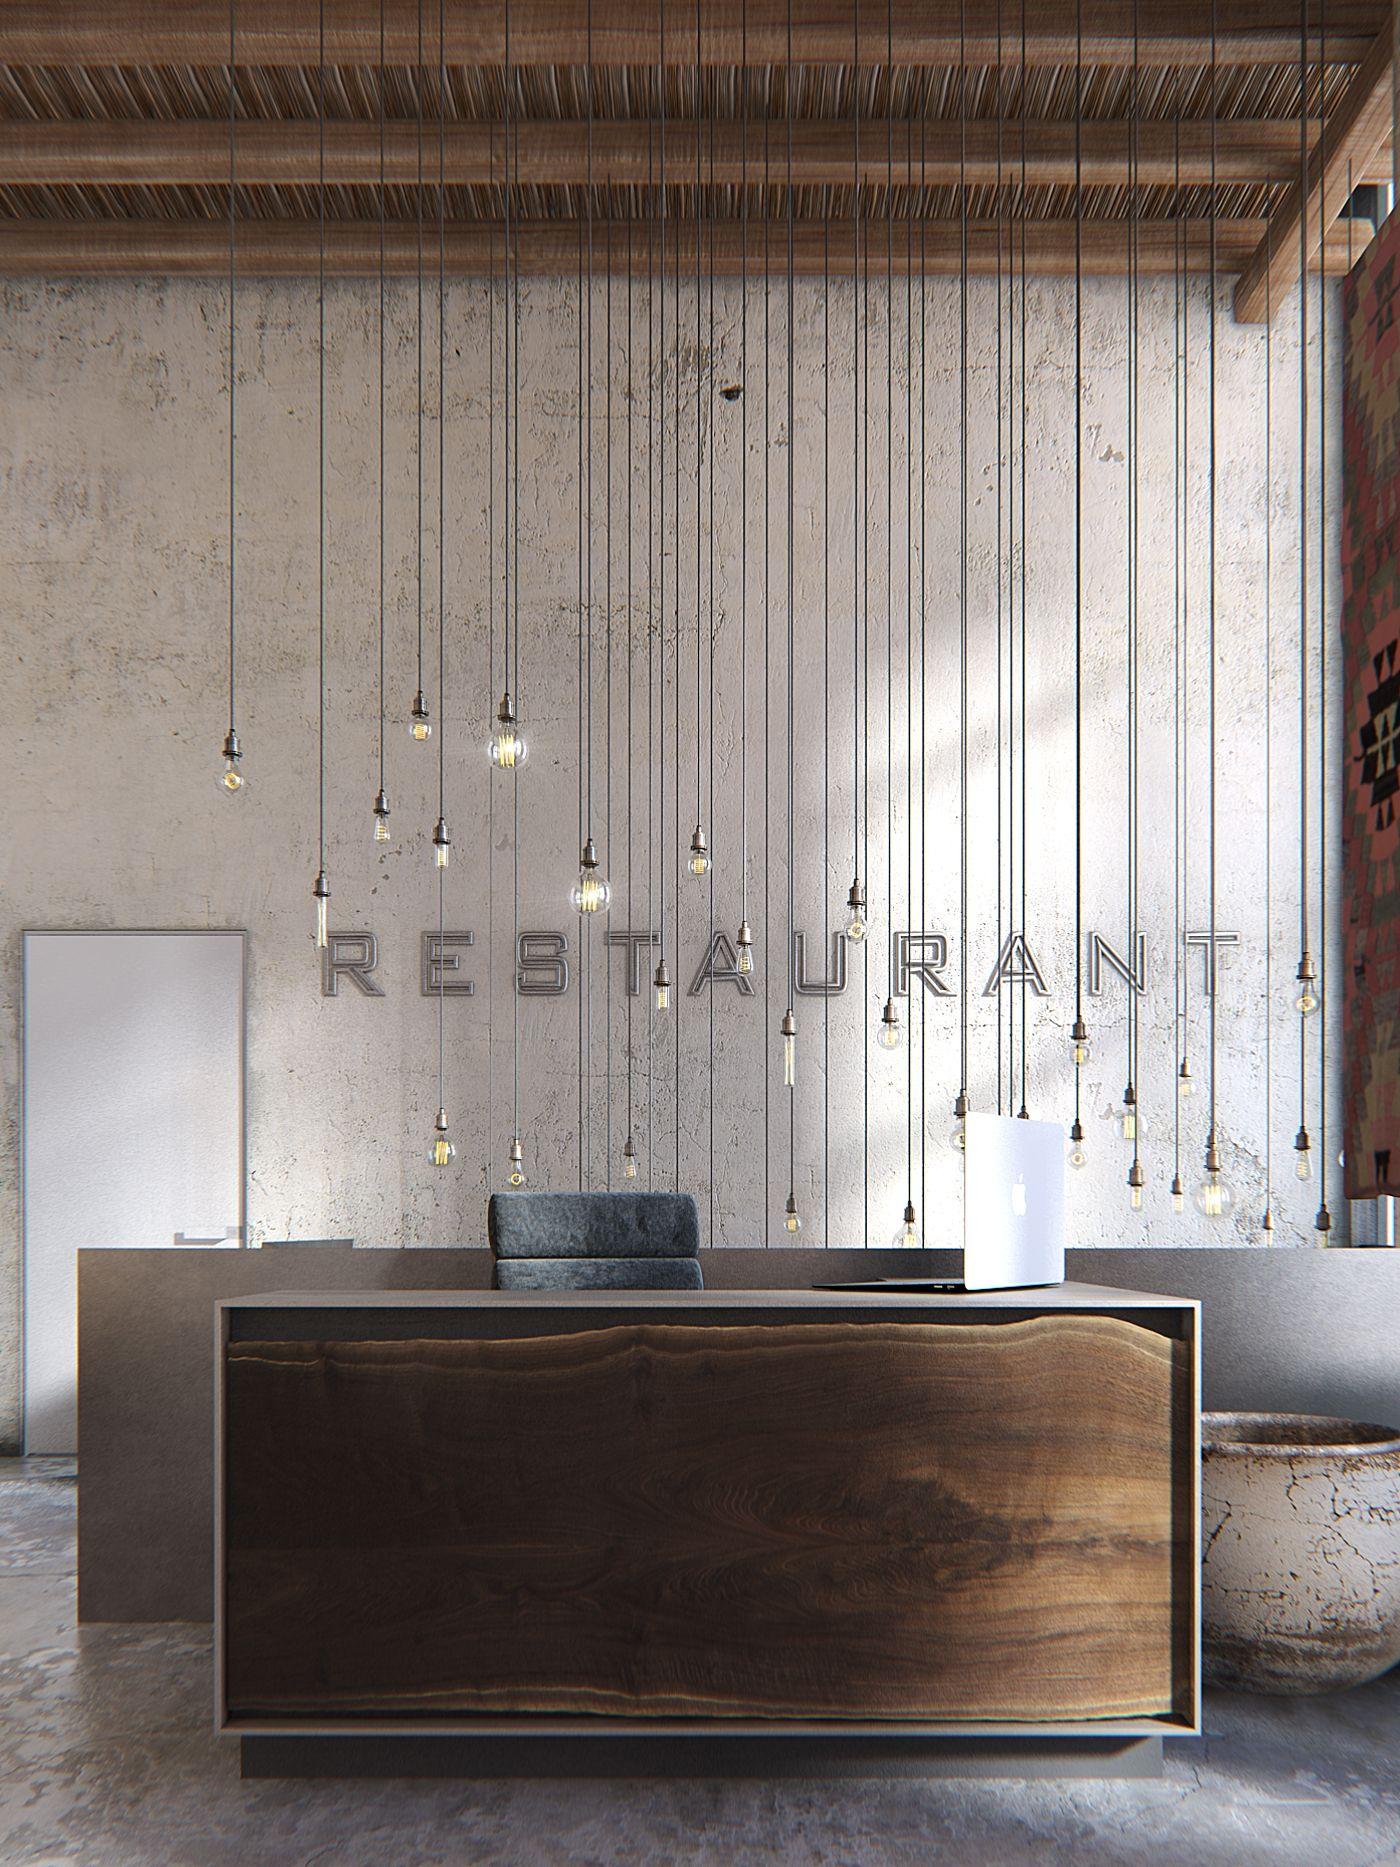 Wabi Sabi Restaurant on Behance | Restaurant Interior Design | Pinterest